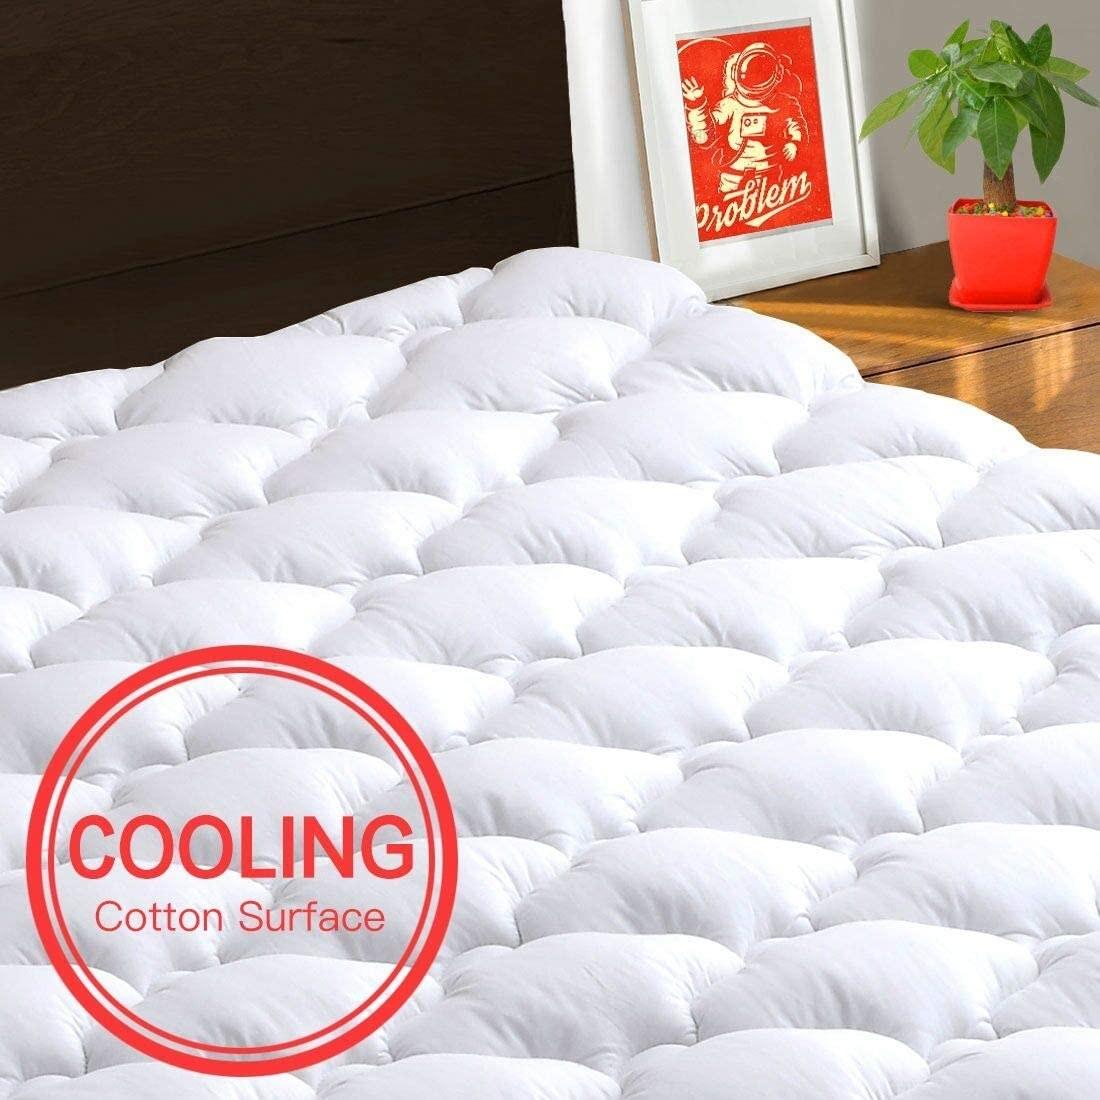 A mattress covered by the TEXARTIST Mattress Pad